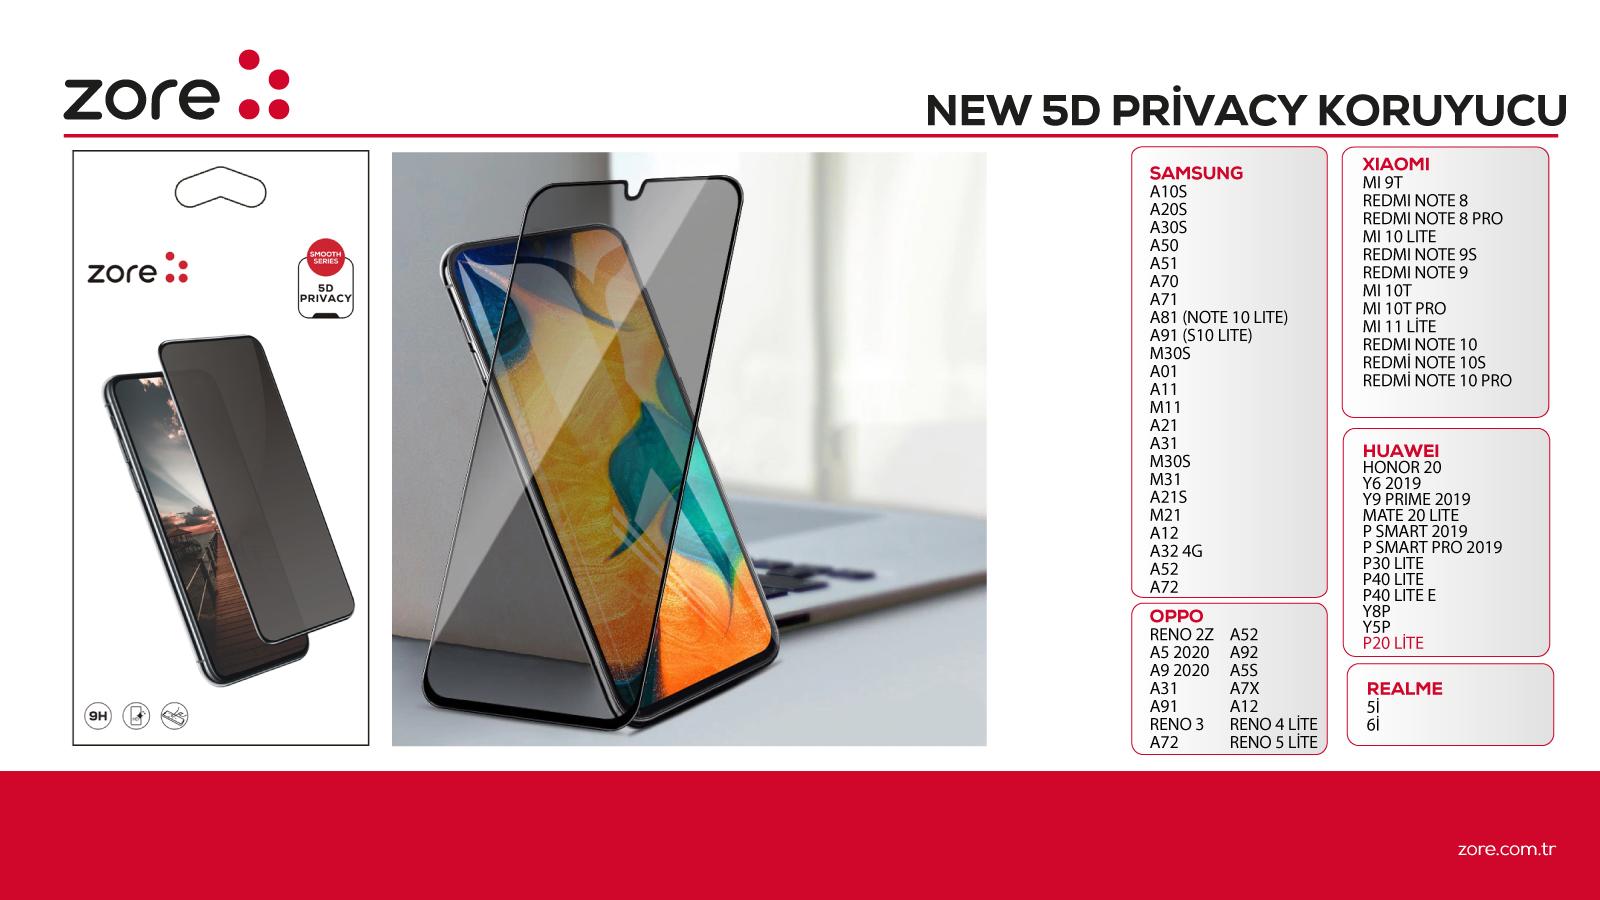 new_5d_privacy_koruyucu.jpg (527 KB)